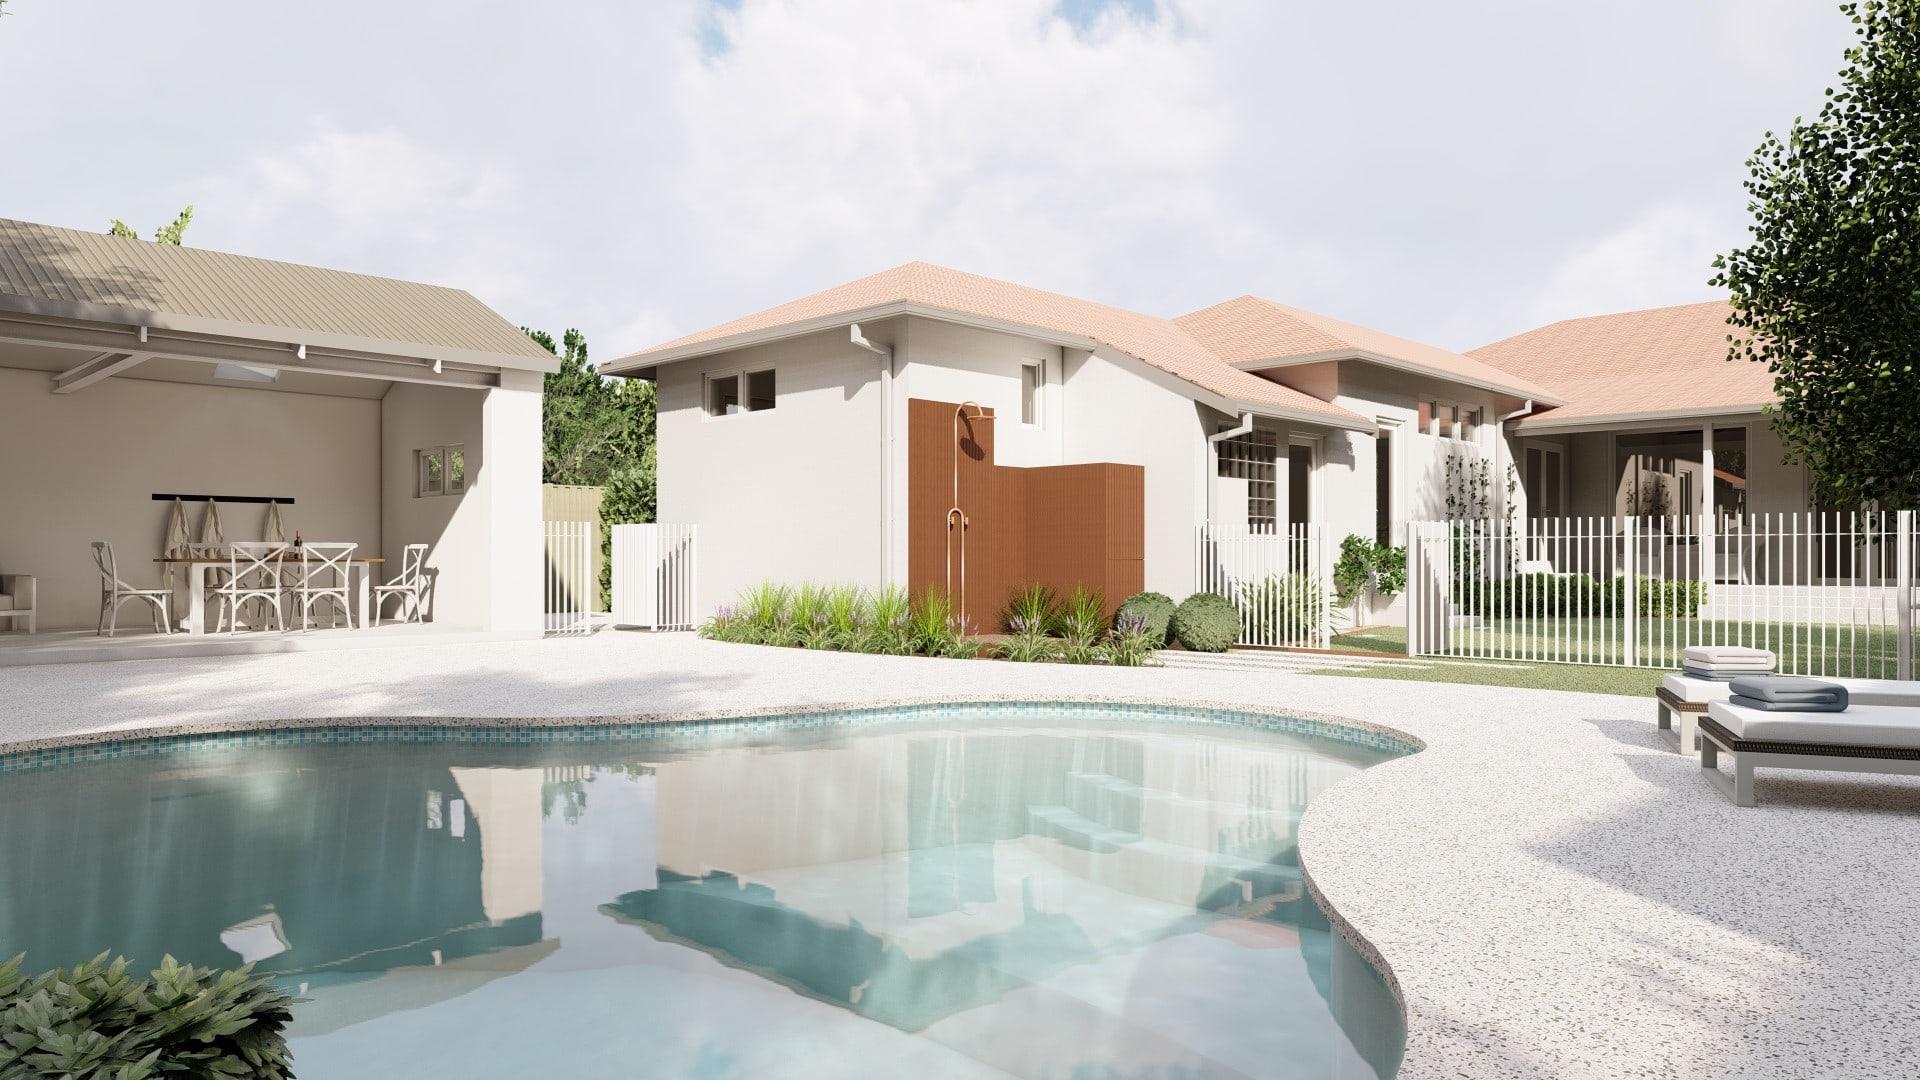 landscape designer perth exteriors and gardens